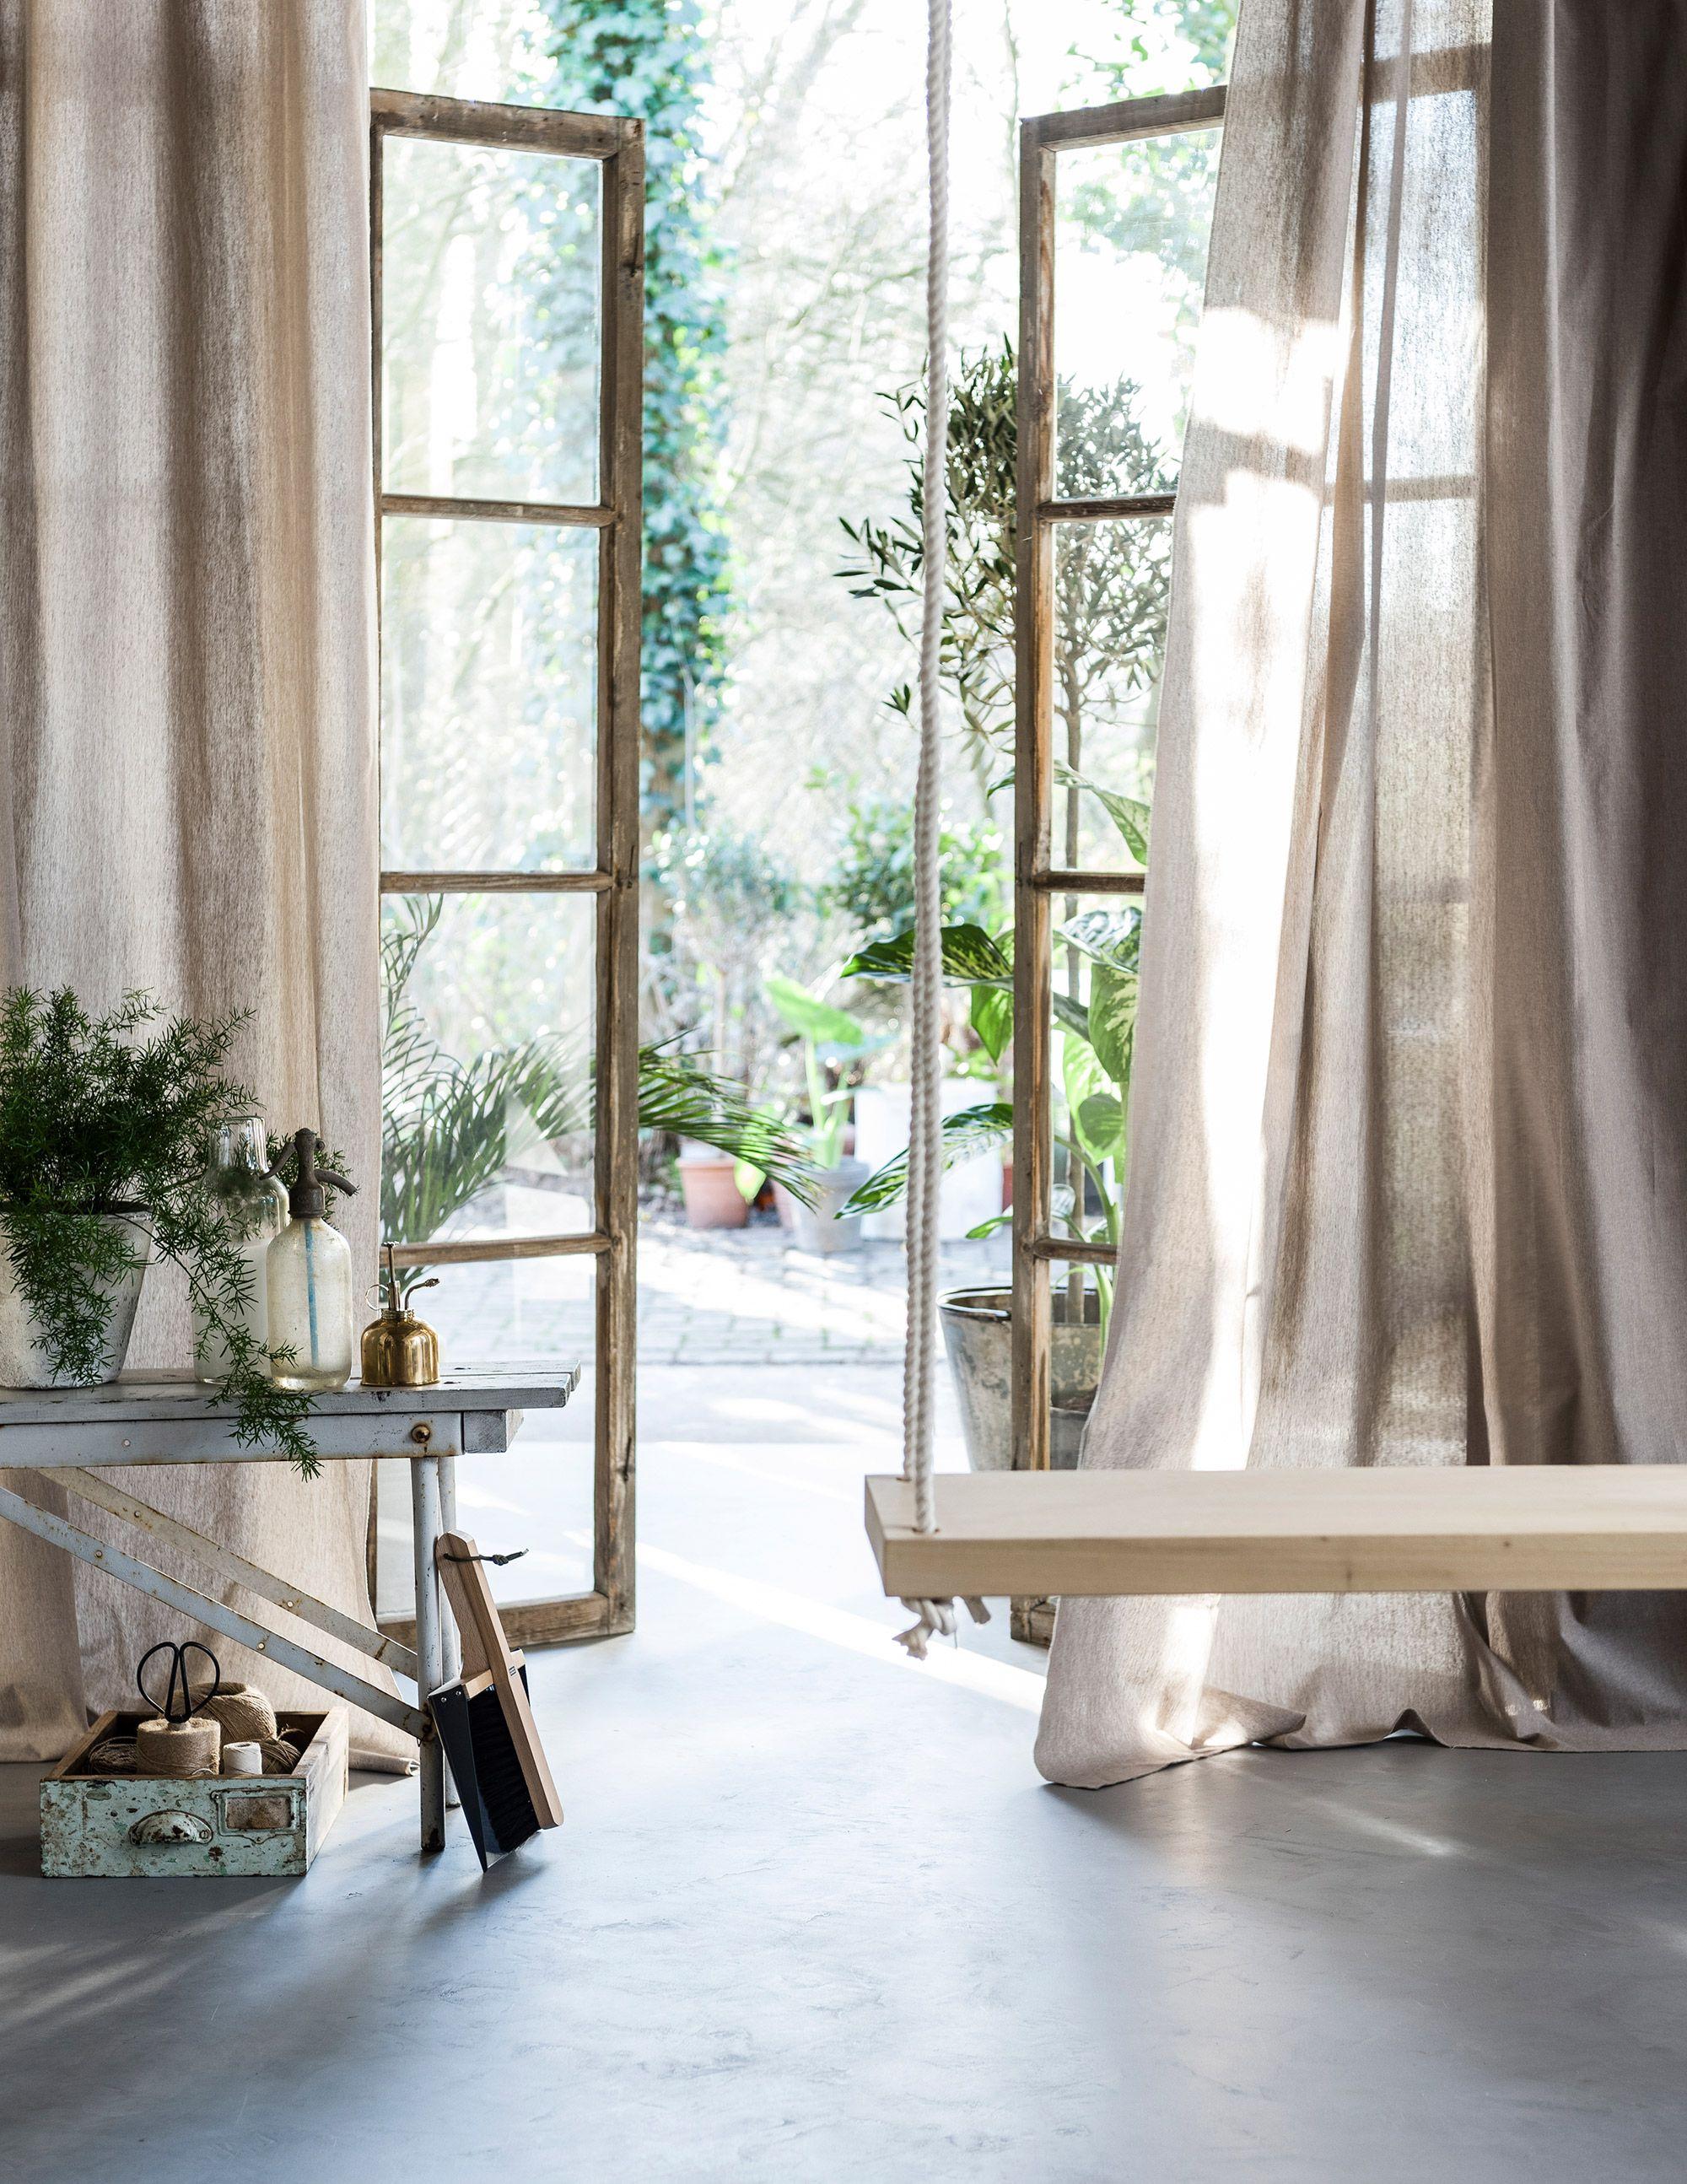 stappenplan gordijnen vtwonen ramen interieurstyling interieurontwerp aards home decor moodboards rustiek